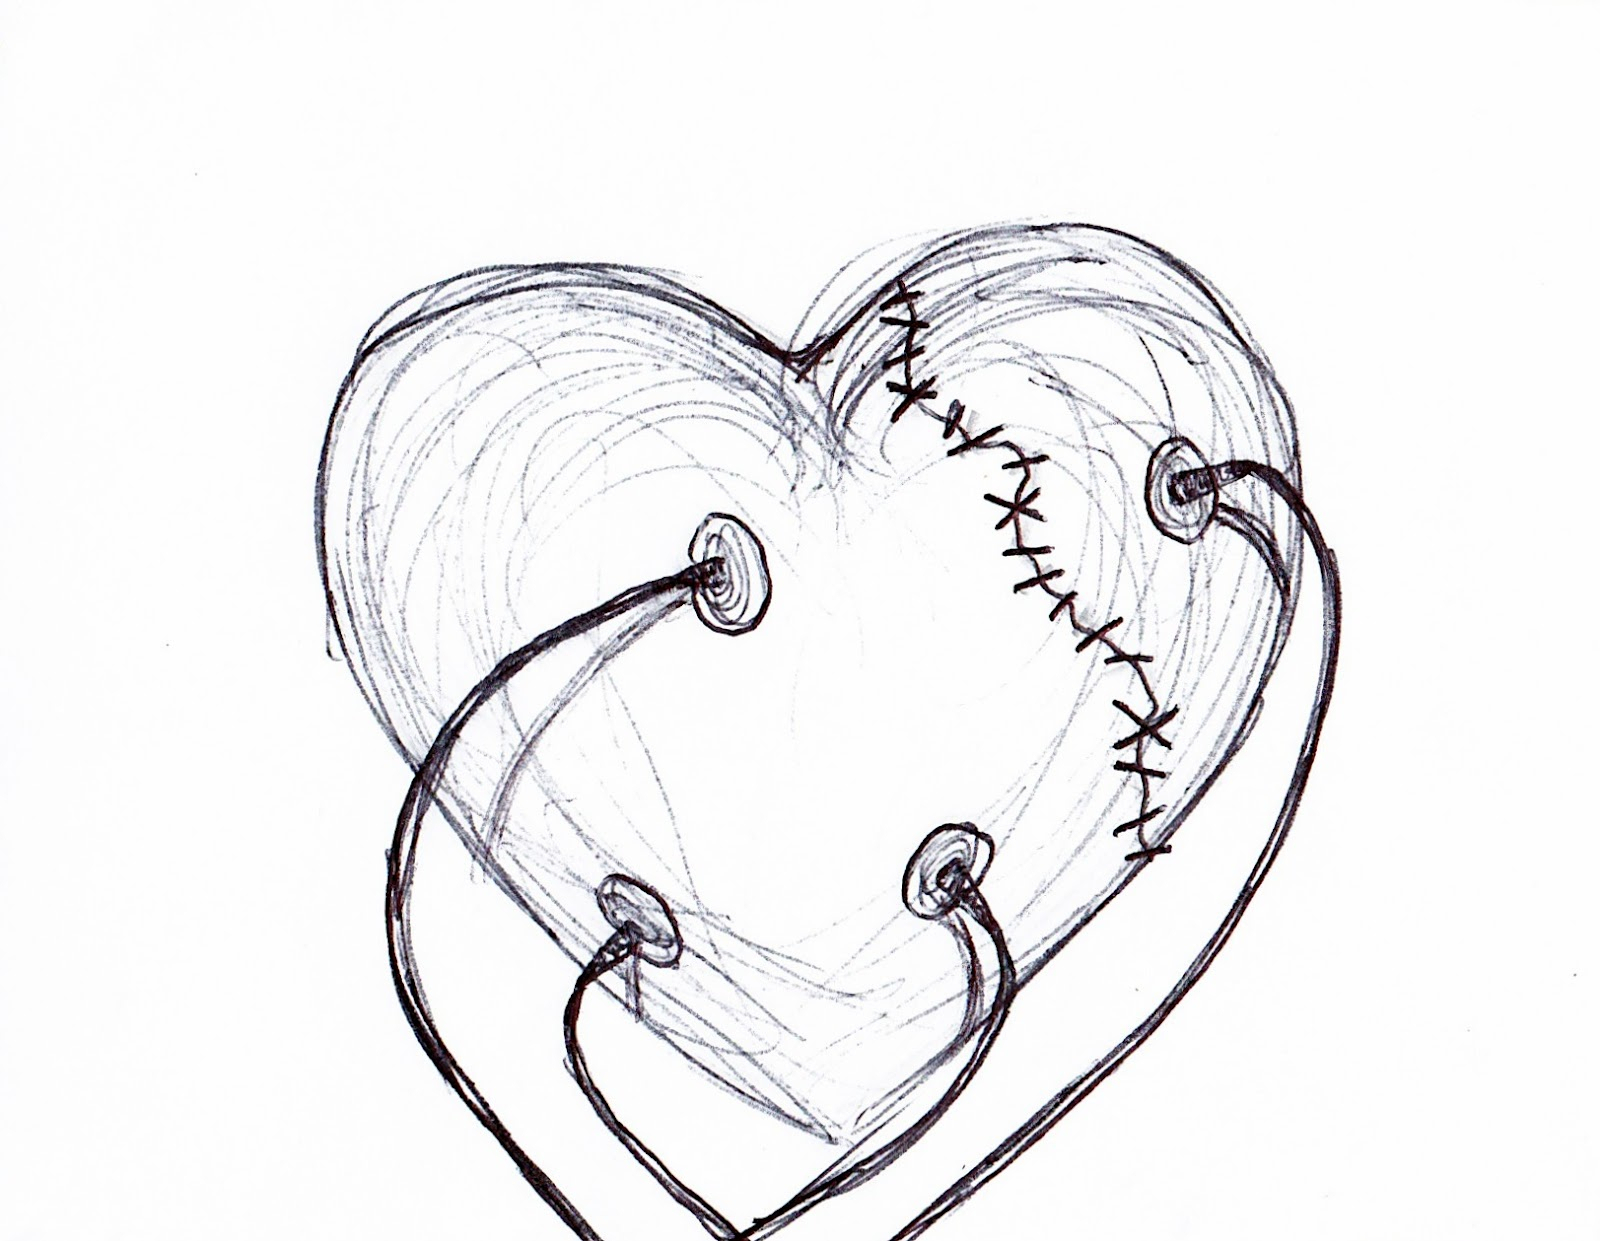 1600x1241 Broken Heart Drawings In Pencil Pencil Sketches Broken Heart Nice